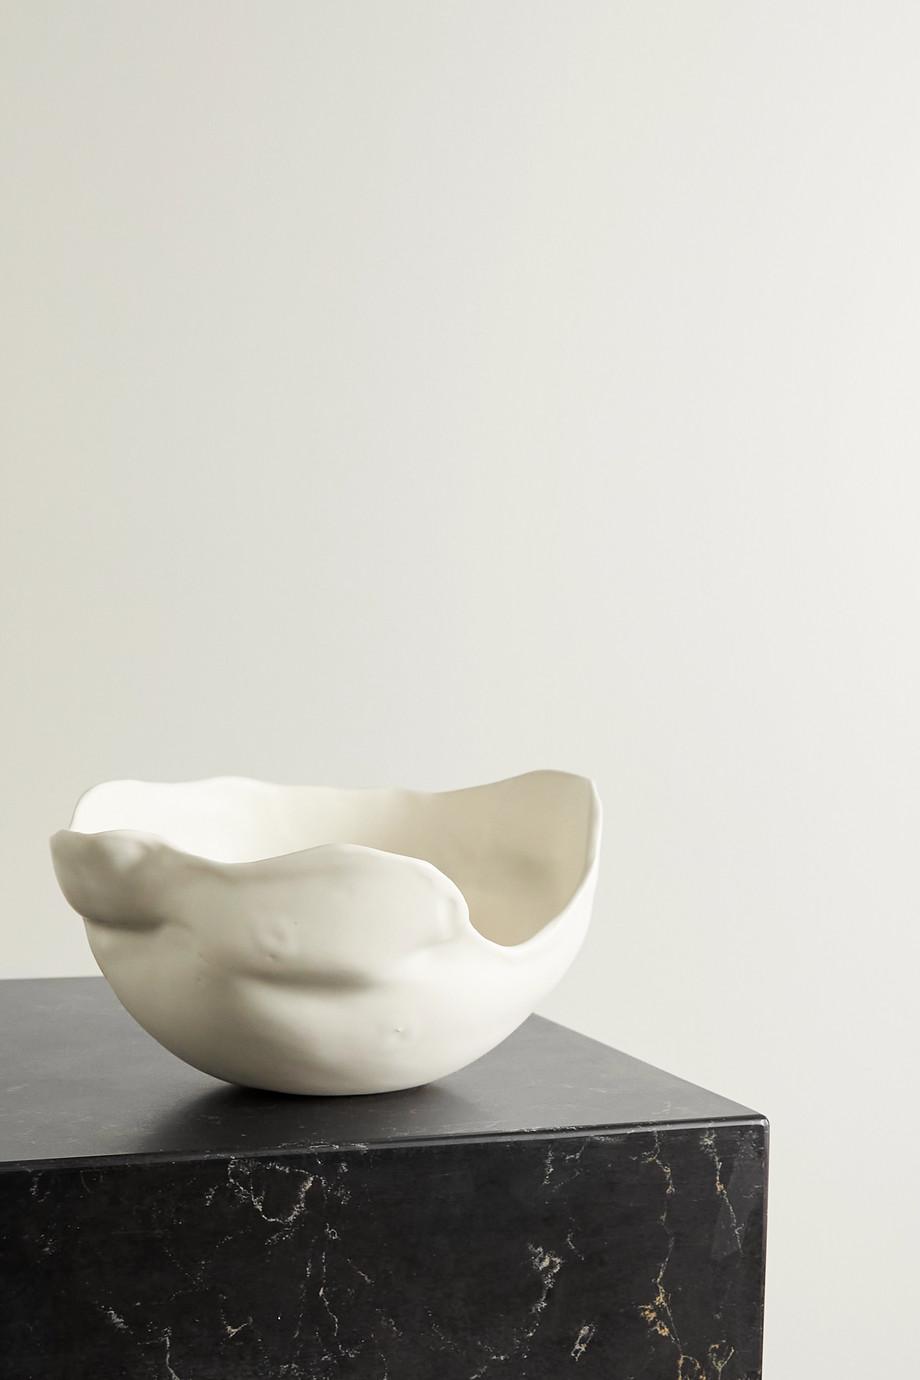 Completedworks + Ekaterina Bazhenova Yamasaki Obstschale aus Keramik